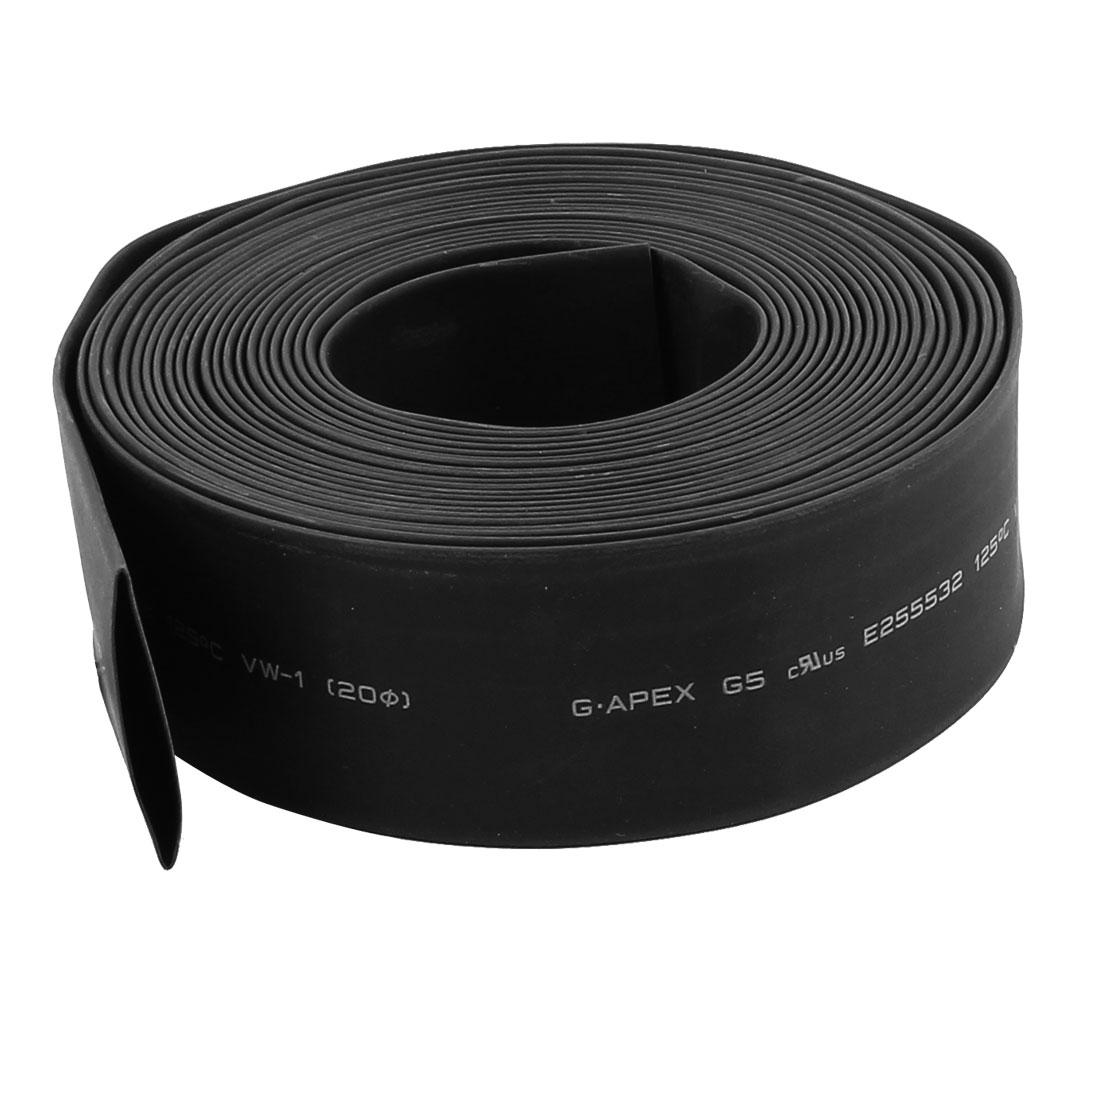 "5m x 0.78"" Diameter 2:1 Shrinkage Ratio PE Insulated Heat Shrink Tubing Black"